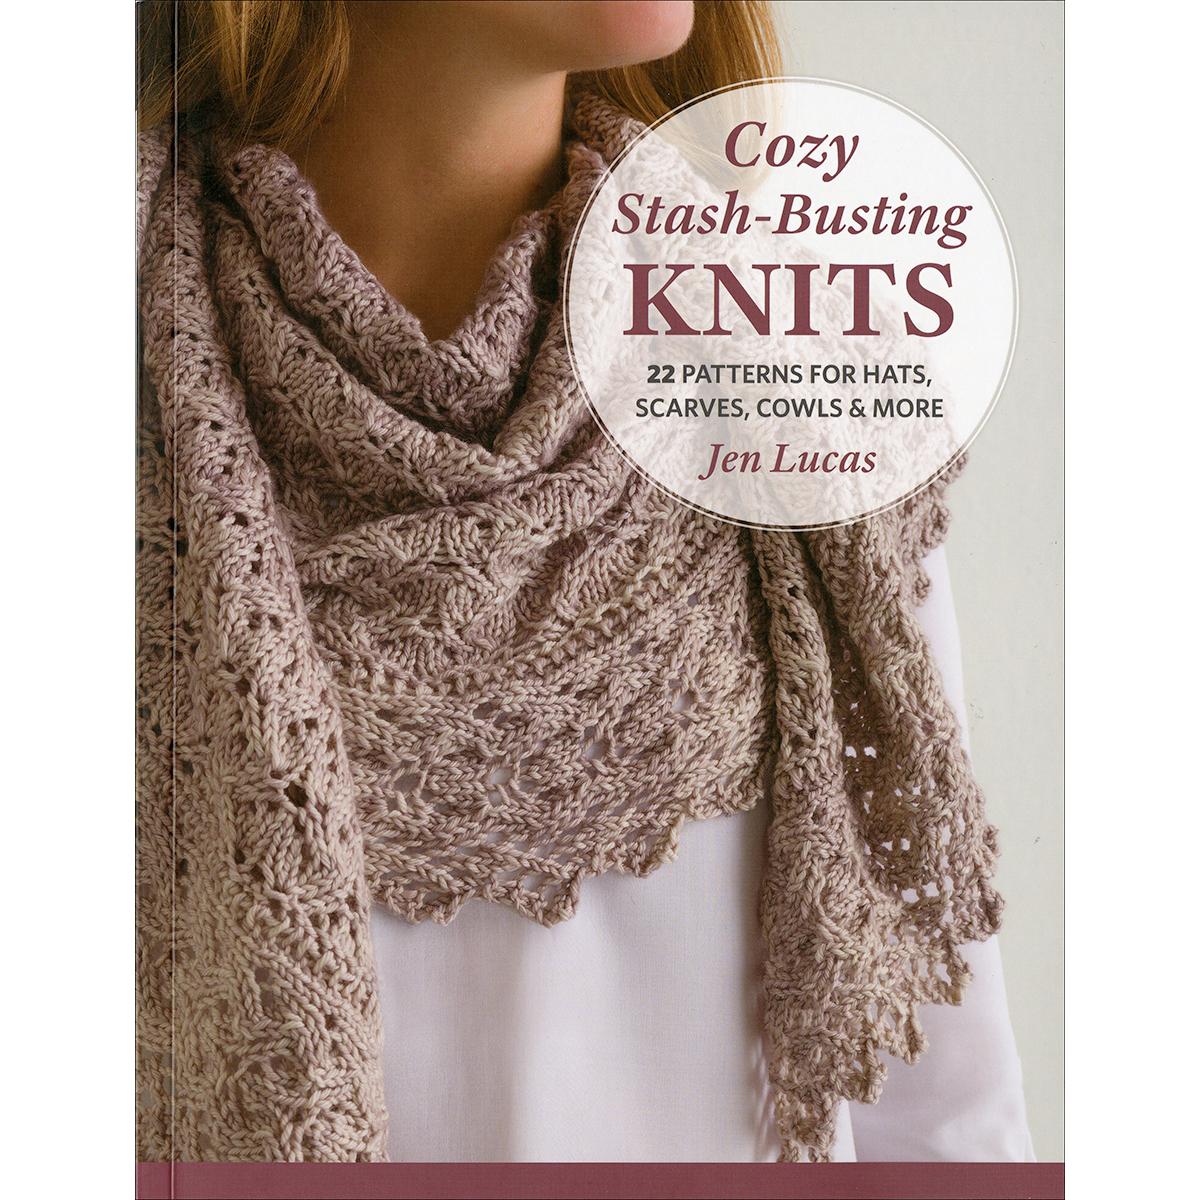 Cozy Stash-Busting Knits by Jen Lucas